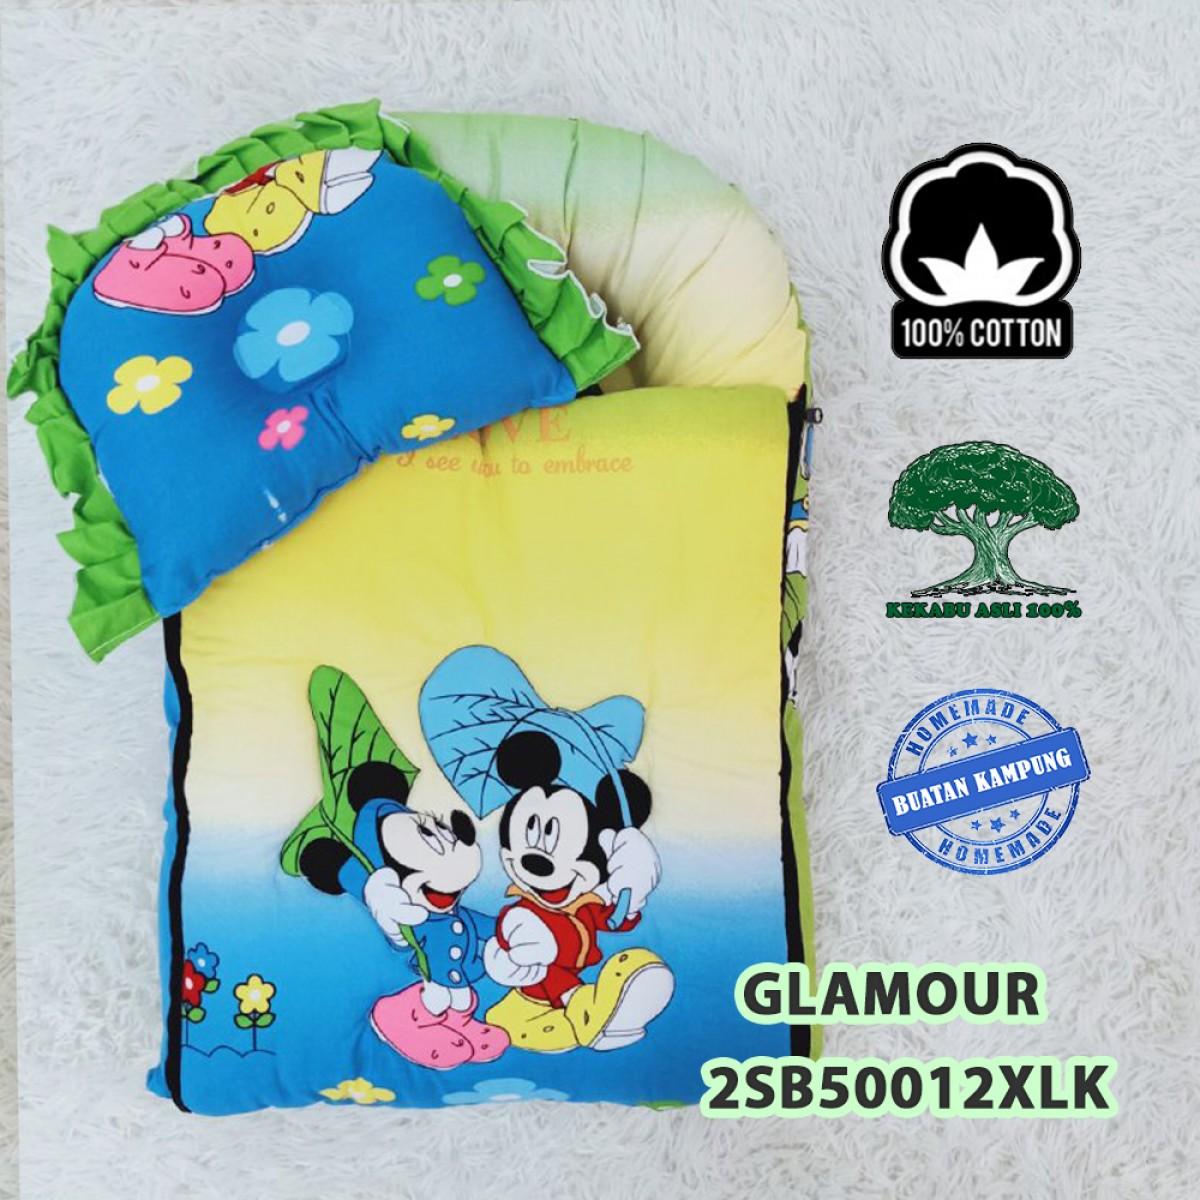 Glamour - Kico Baby Center